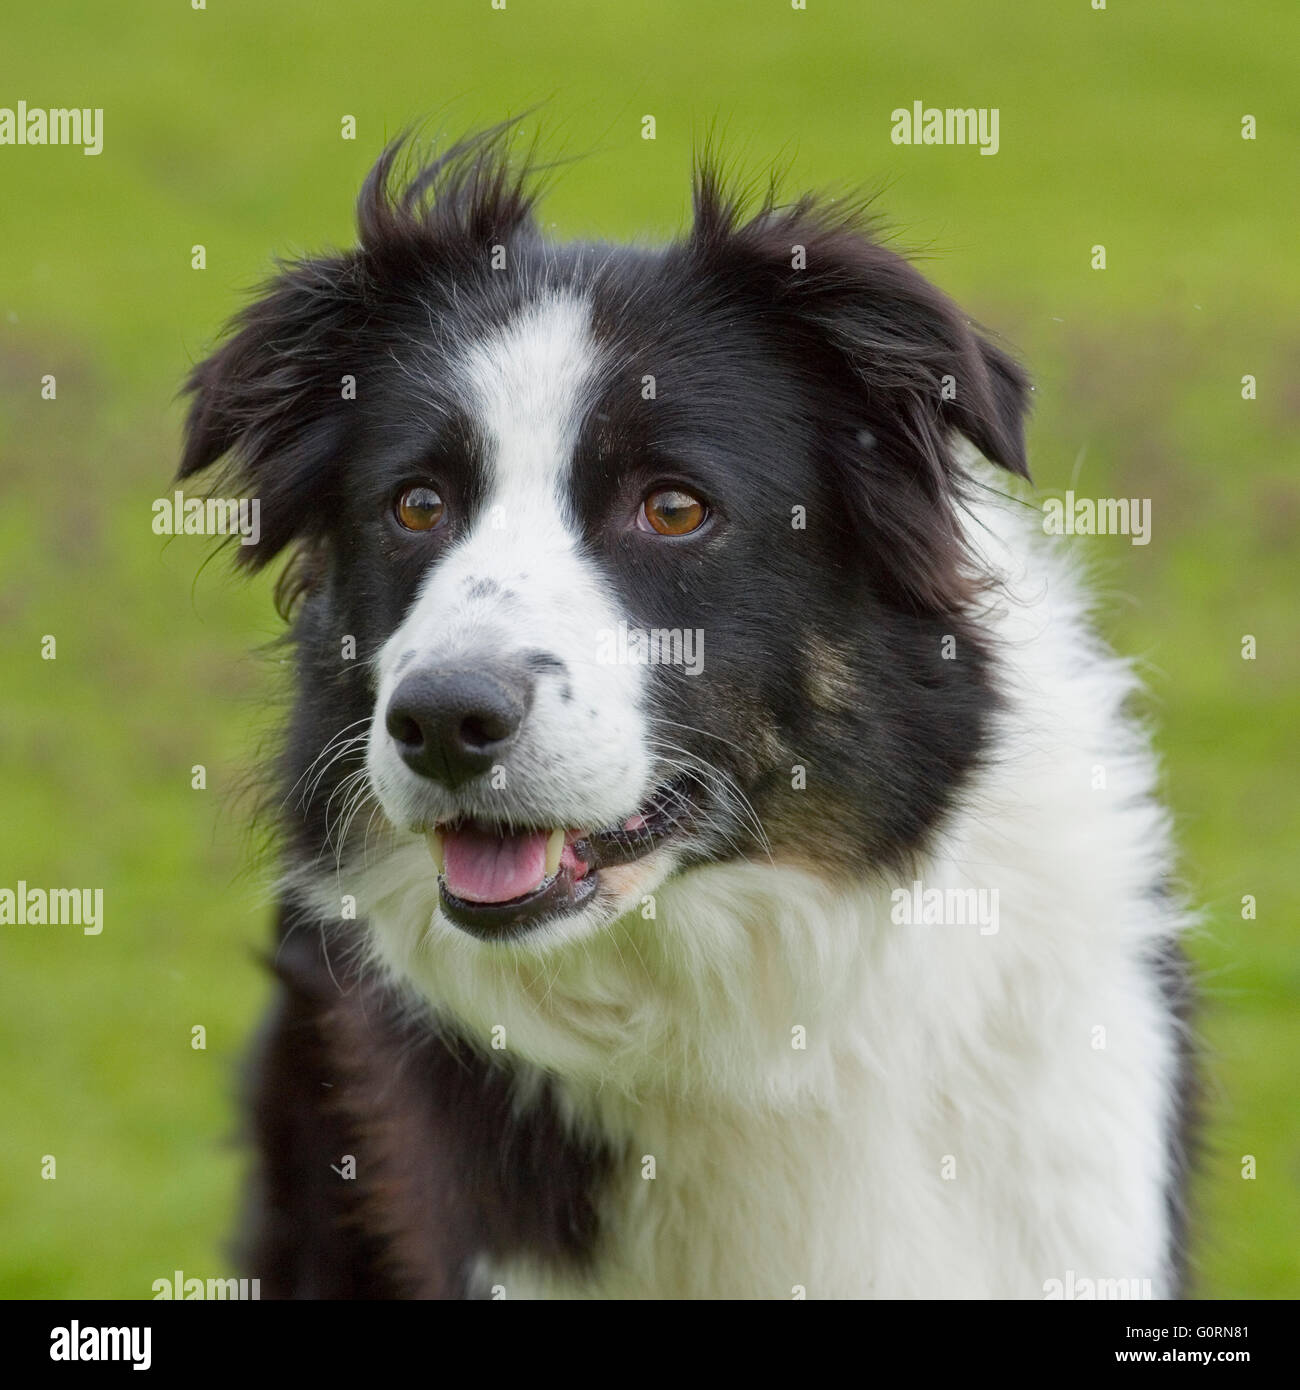 border collie head - Stock Image